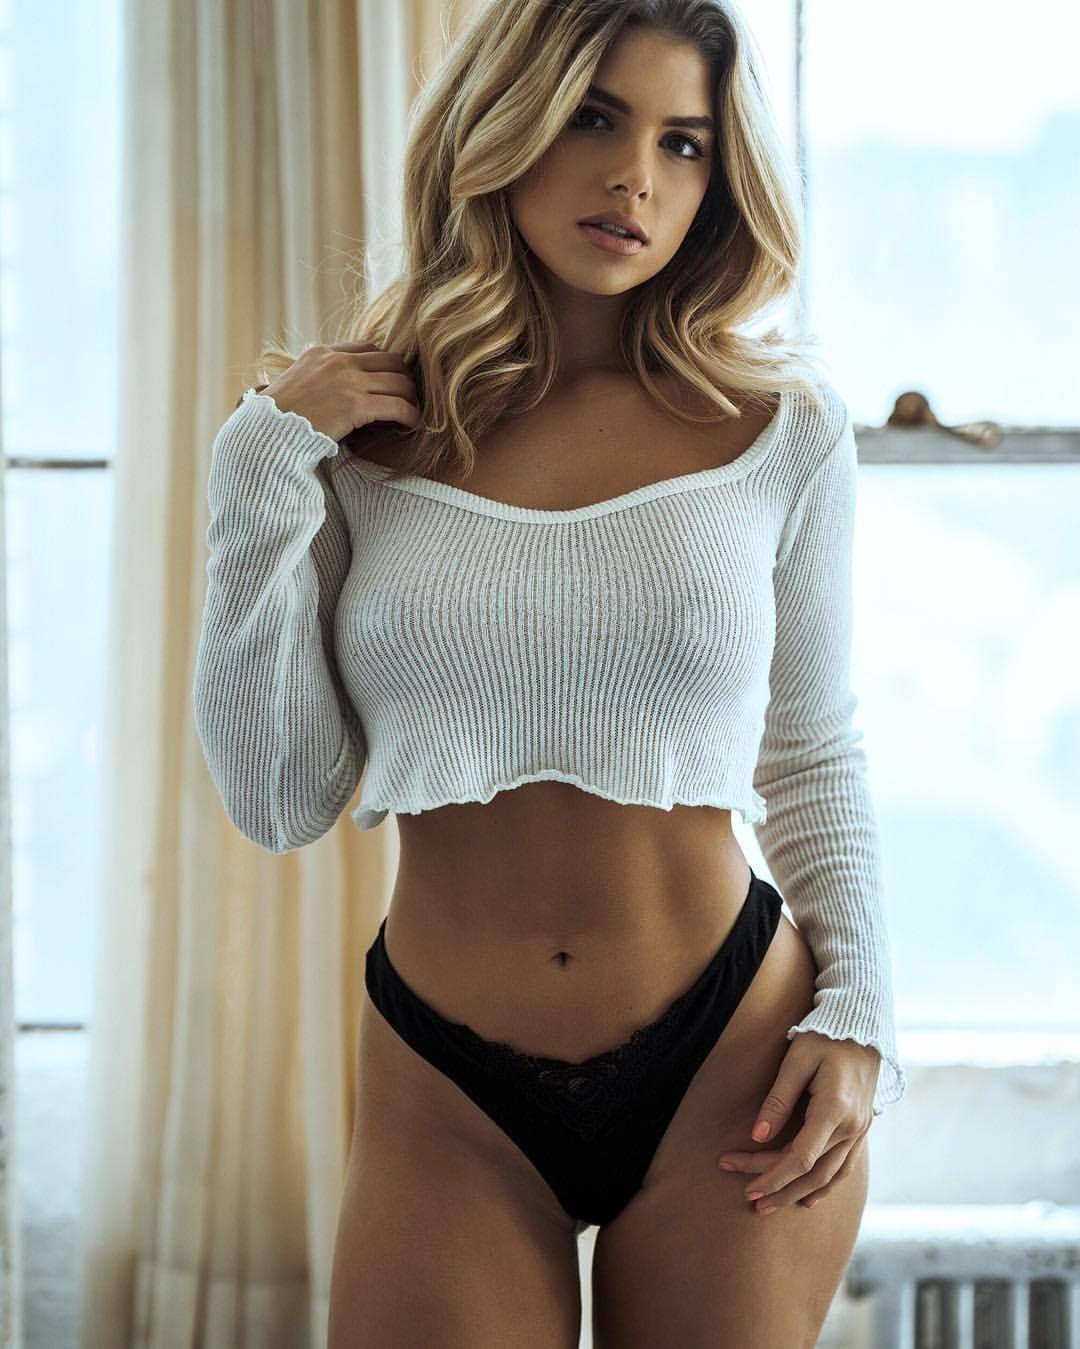 Bikini Mia Sand nude photos 2019